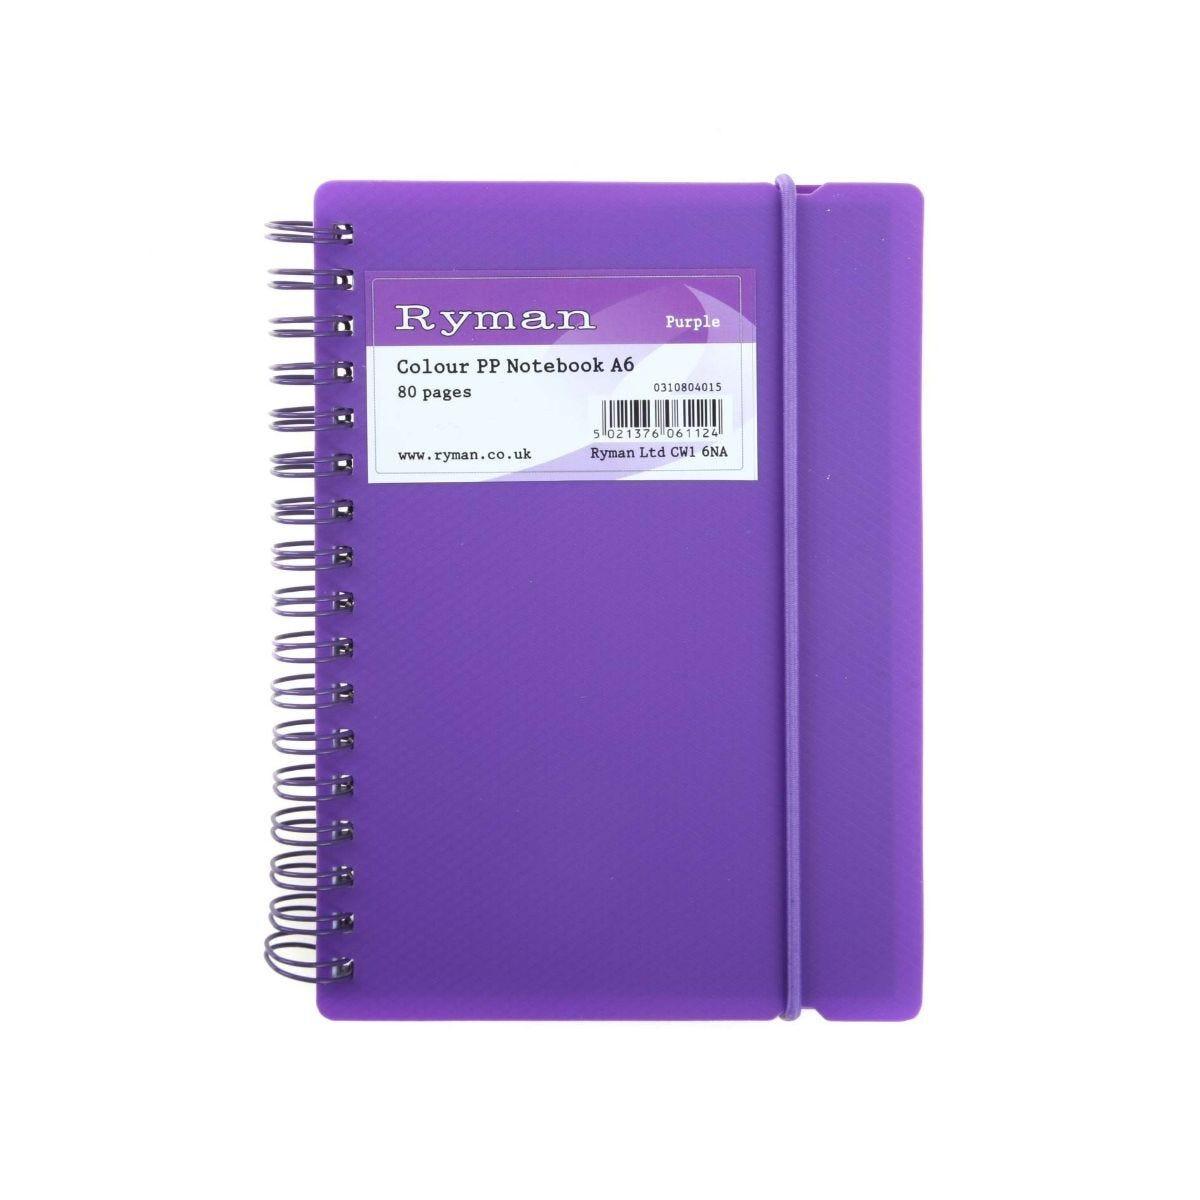 Ryman Colour Polypropylene Notebook A6 80 Pages 40 Sheets Purple